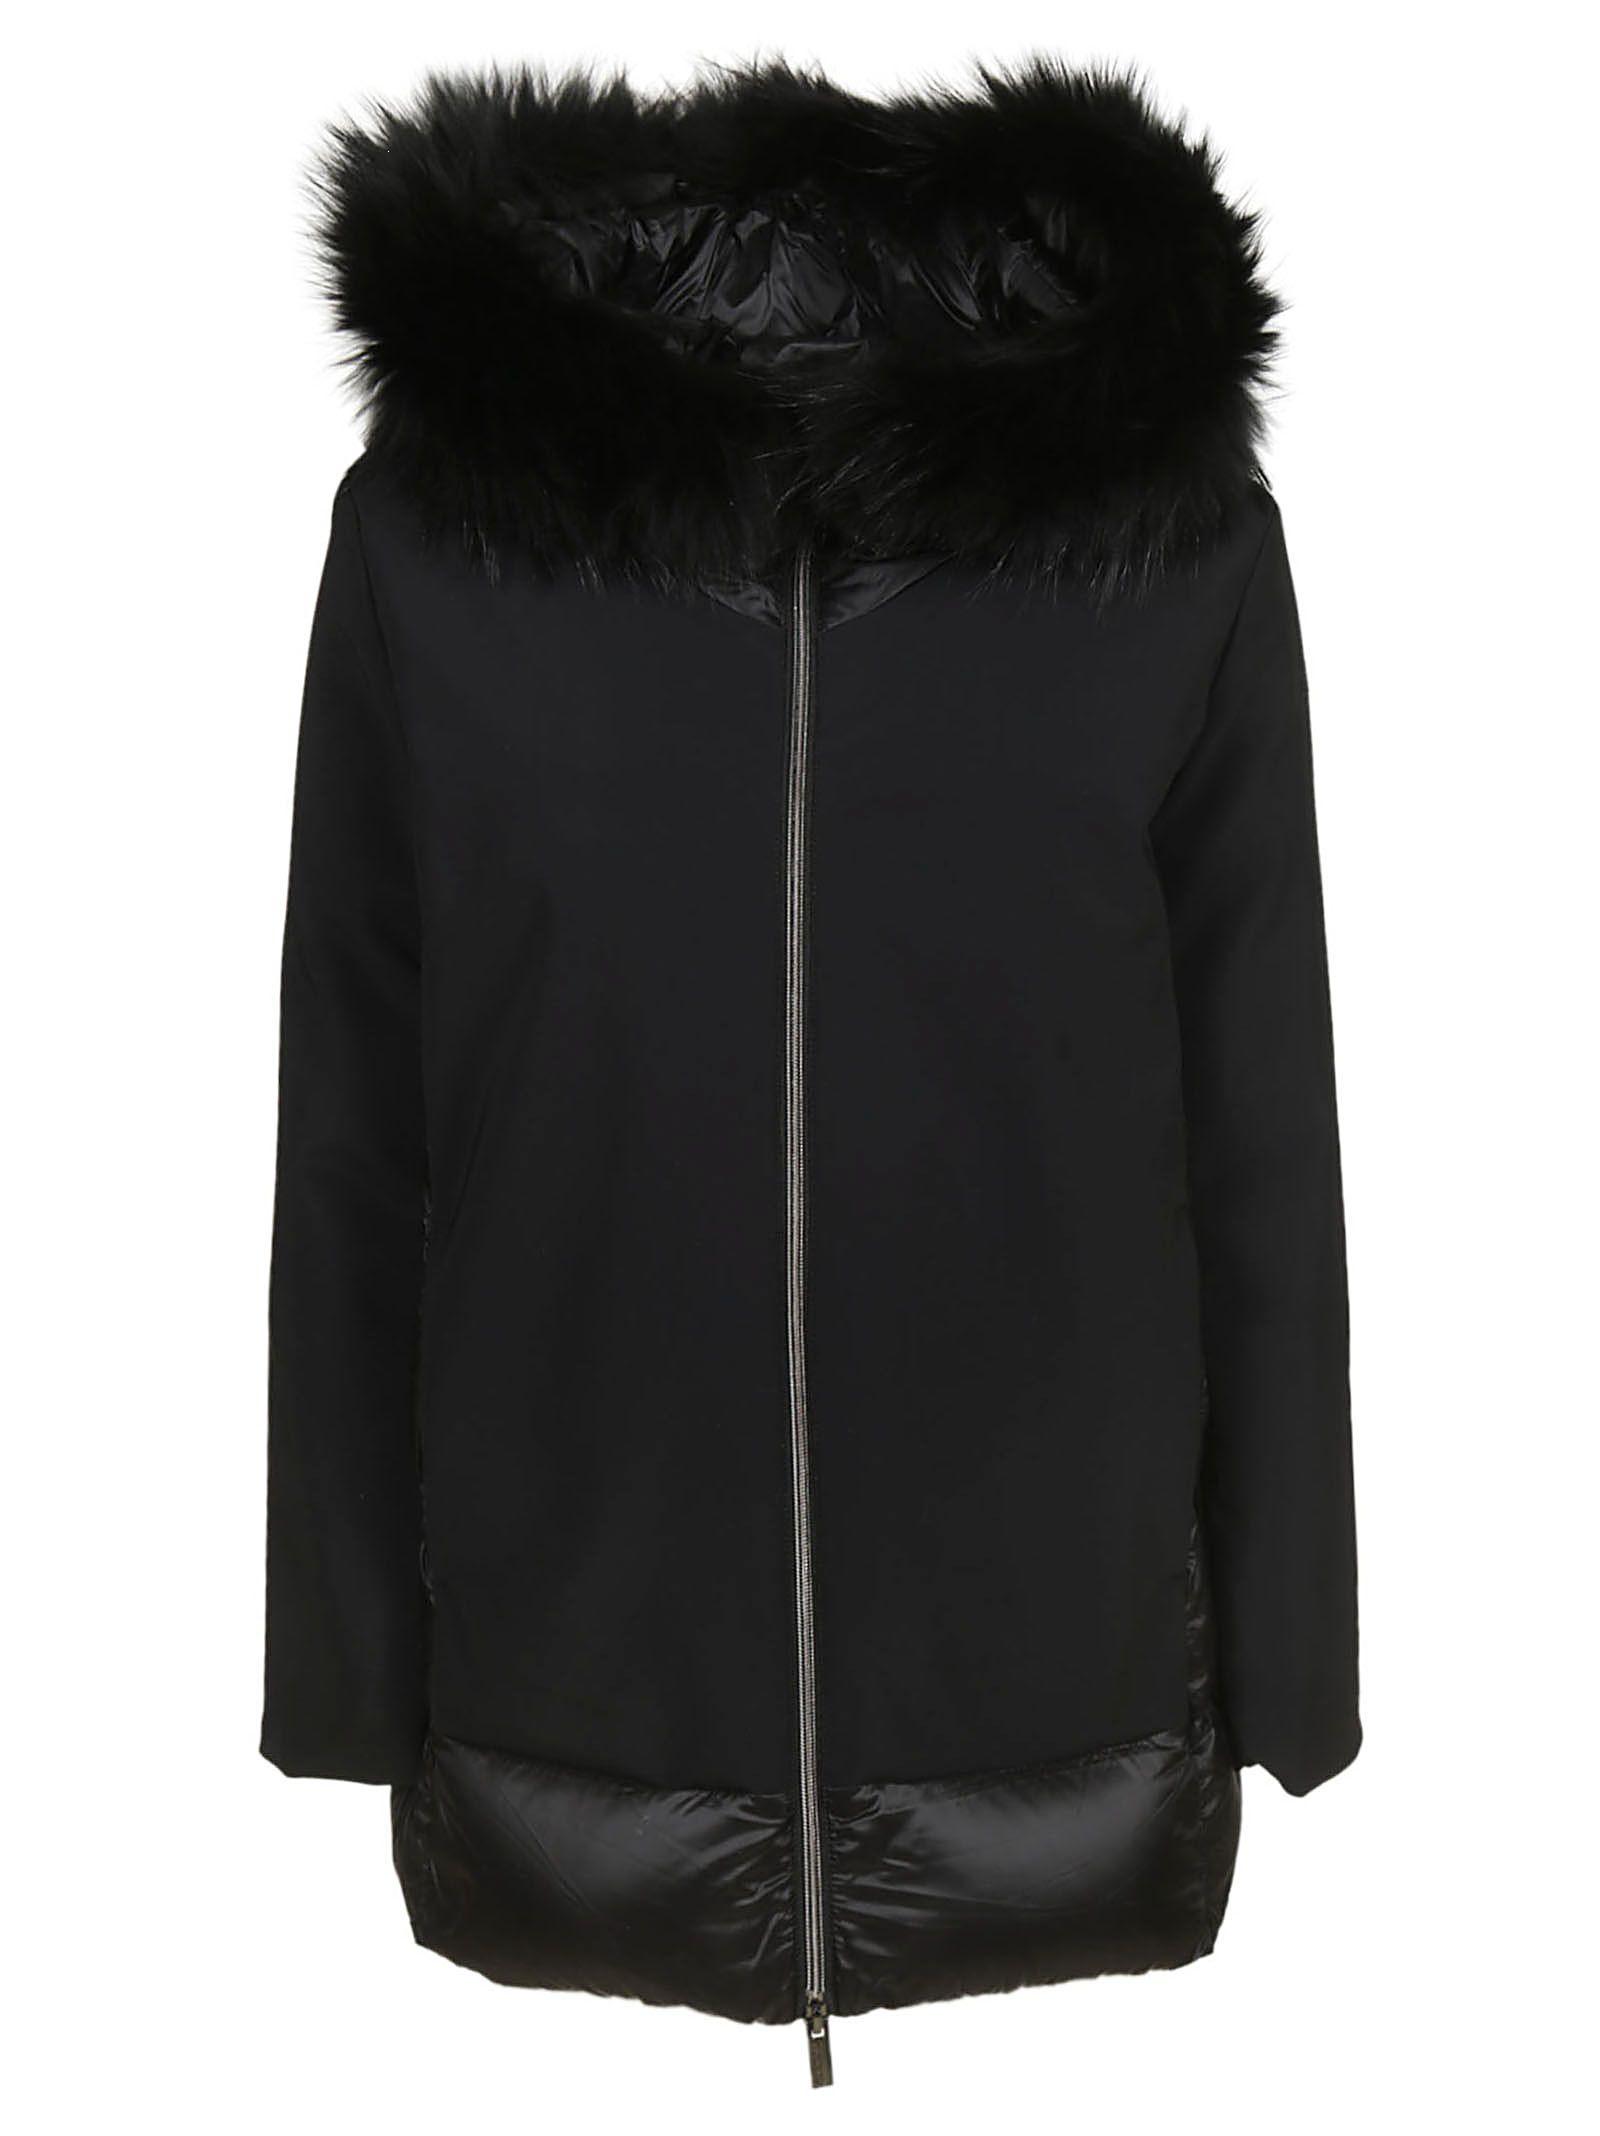 Rrd - Roberto Ricci Design Fur Trim Hooded Jacket, Nero